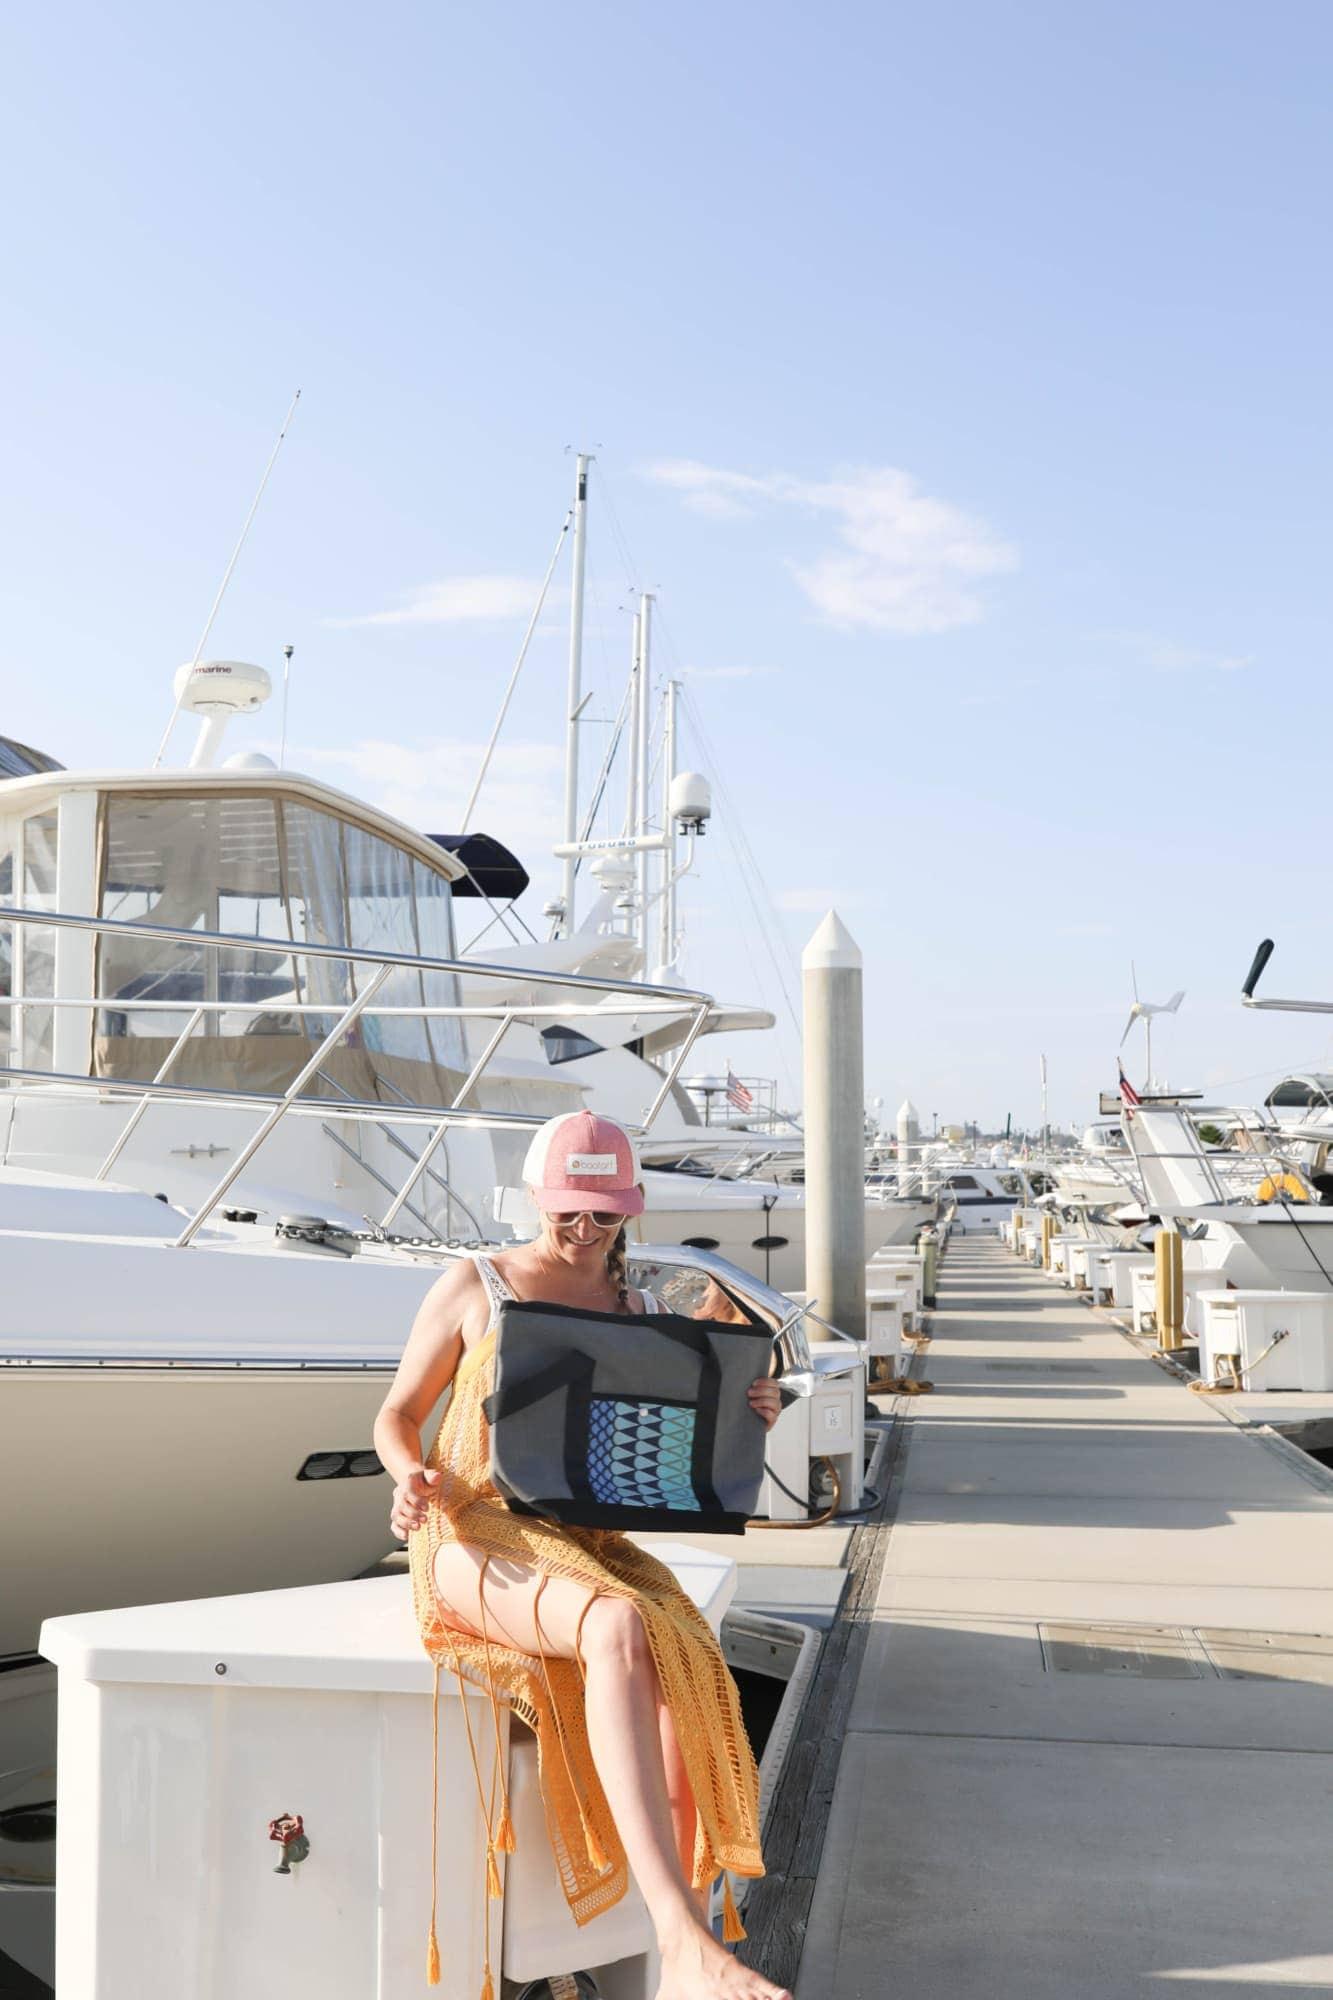 citygirlgonemom in marina